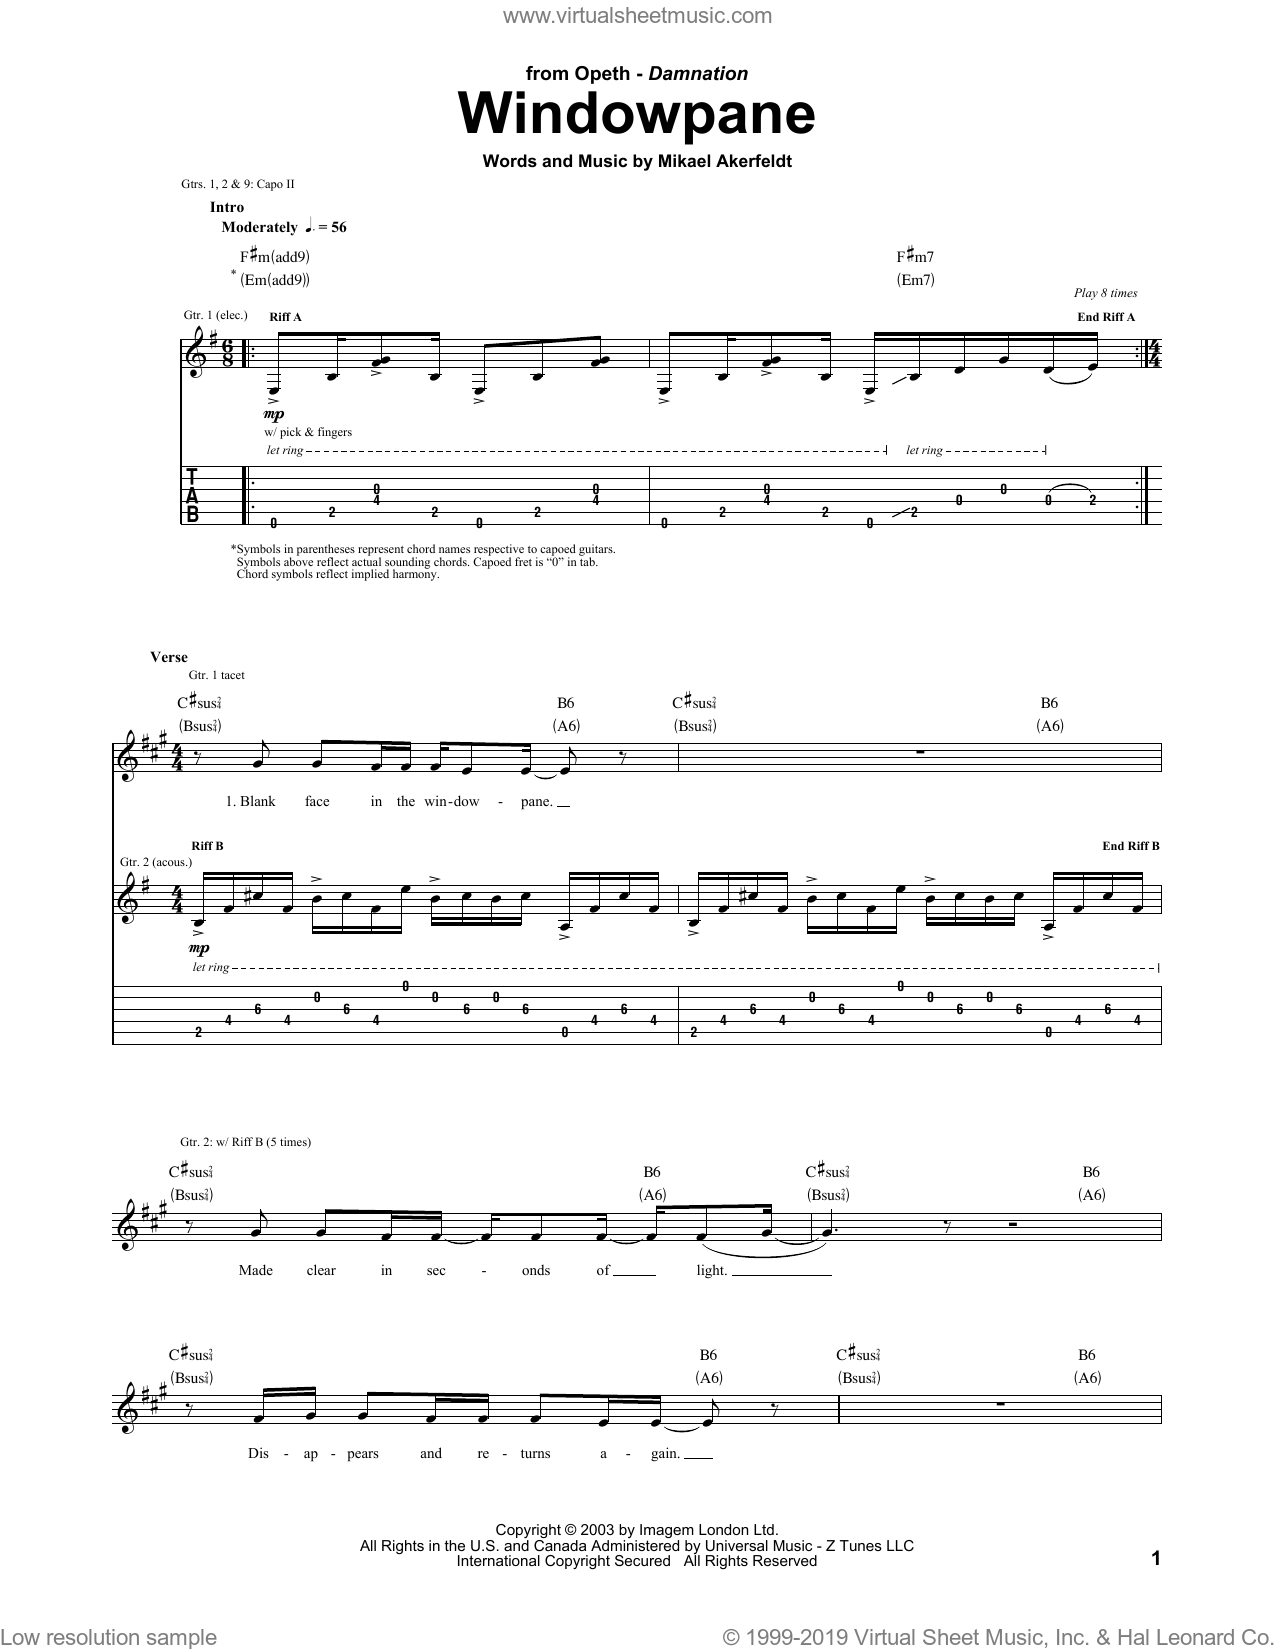 Windowpane sheet music for guitar (tablature) by Opeth and Mikael Akerfeldt, intermediate skill level